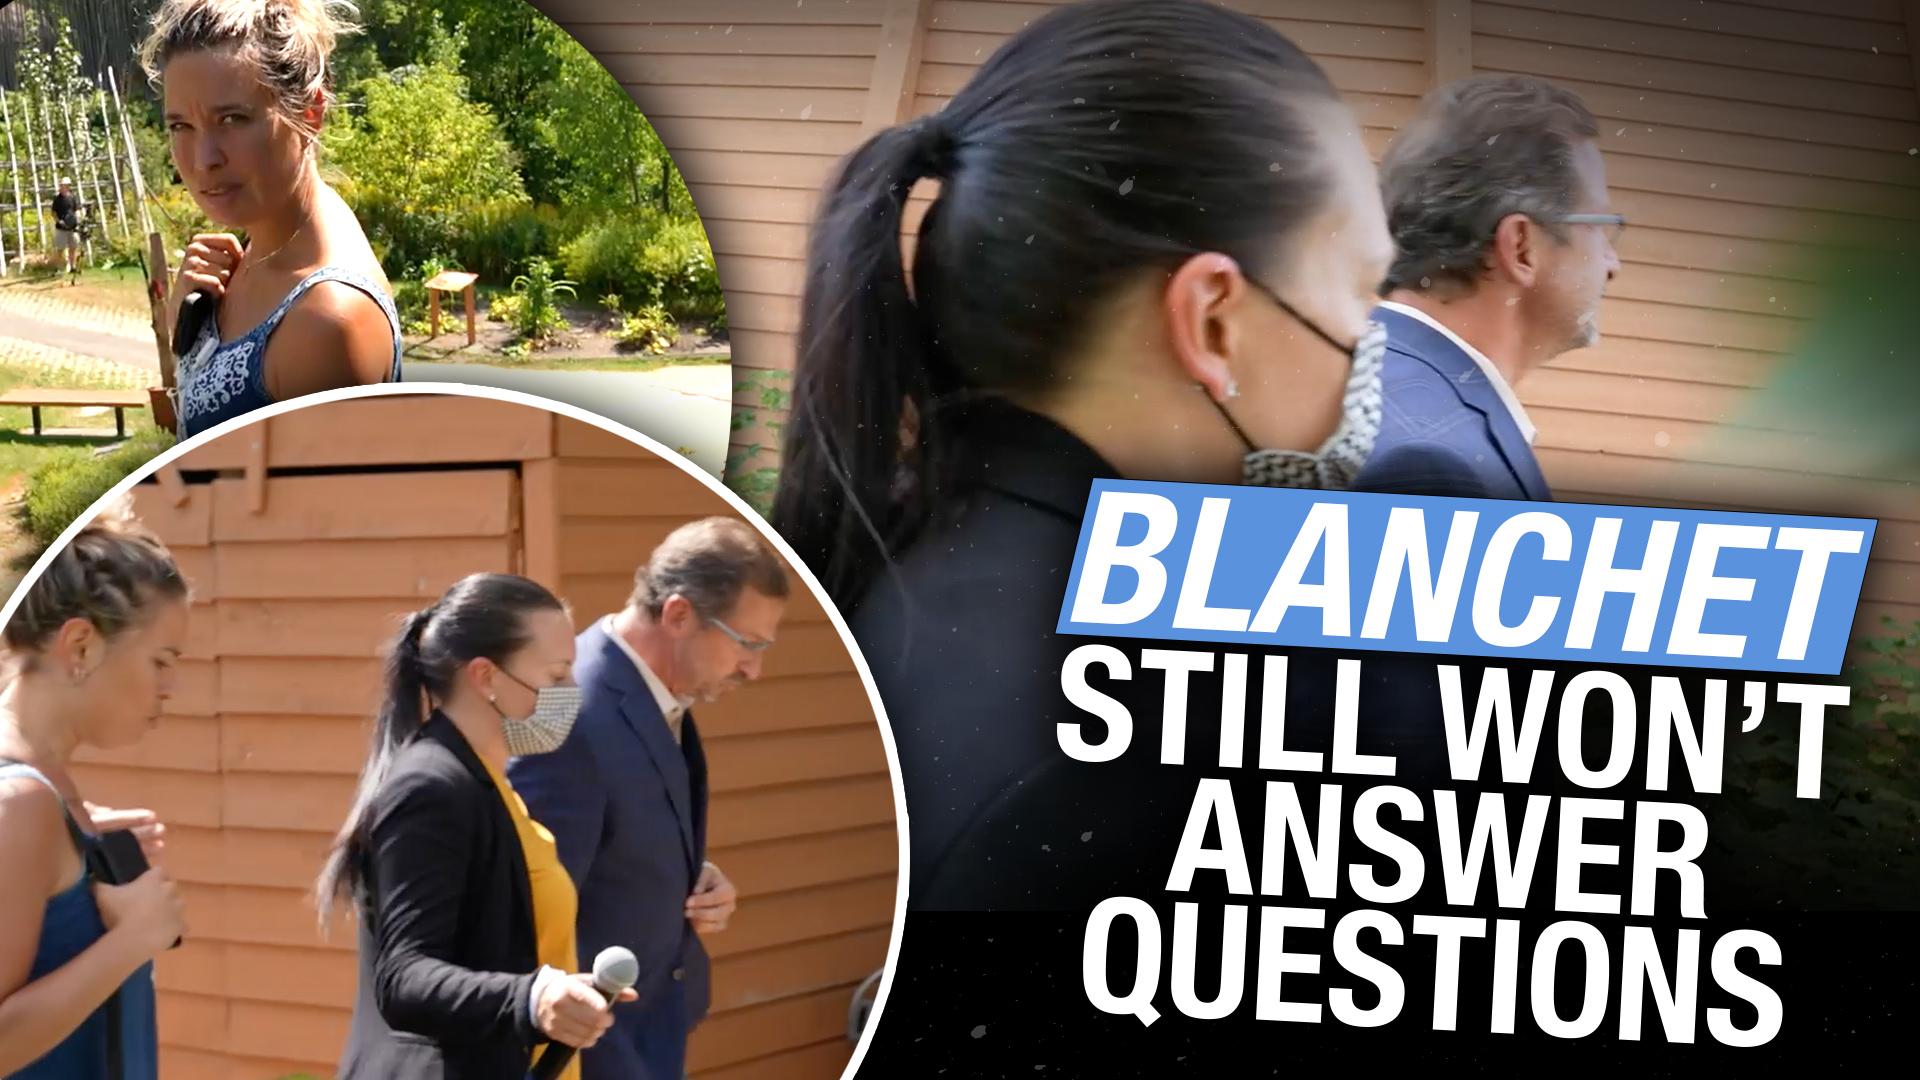 Yves-François Blanchet, leader of the Bloc Québécois ignores questions on vaccine passports